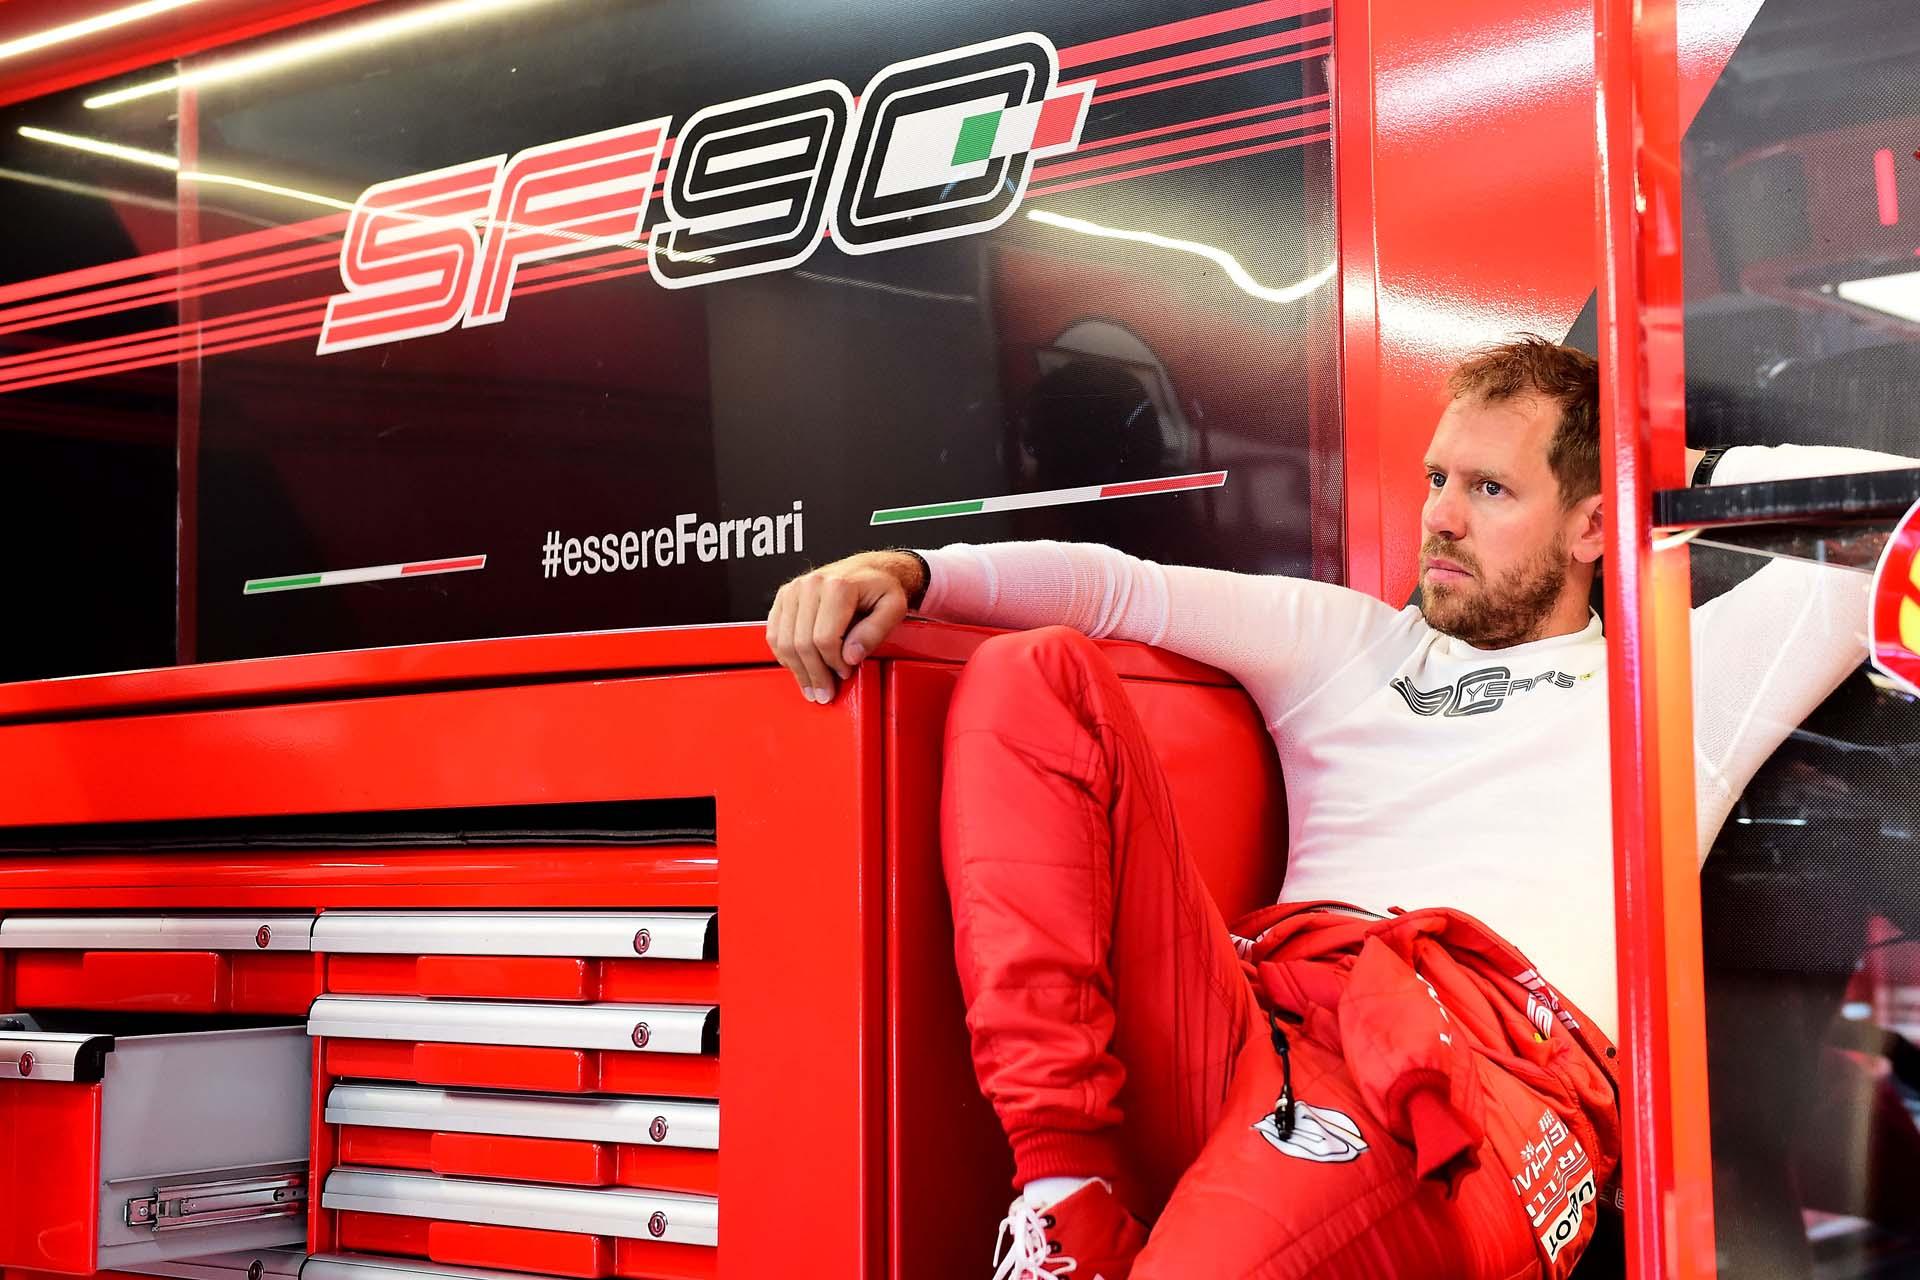 Sebastian Vettel, Ferrari, French GP, Paul Ricard GP FRANCIA F1/2019 - SABATO 22/06/2019 credit: @Scuderia Ferrari Press Office